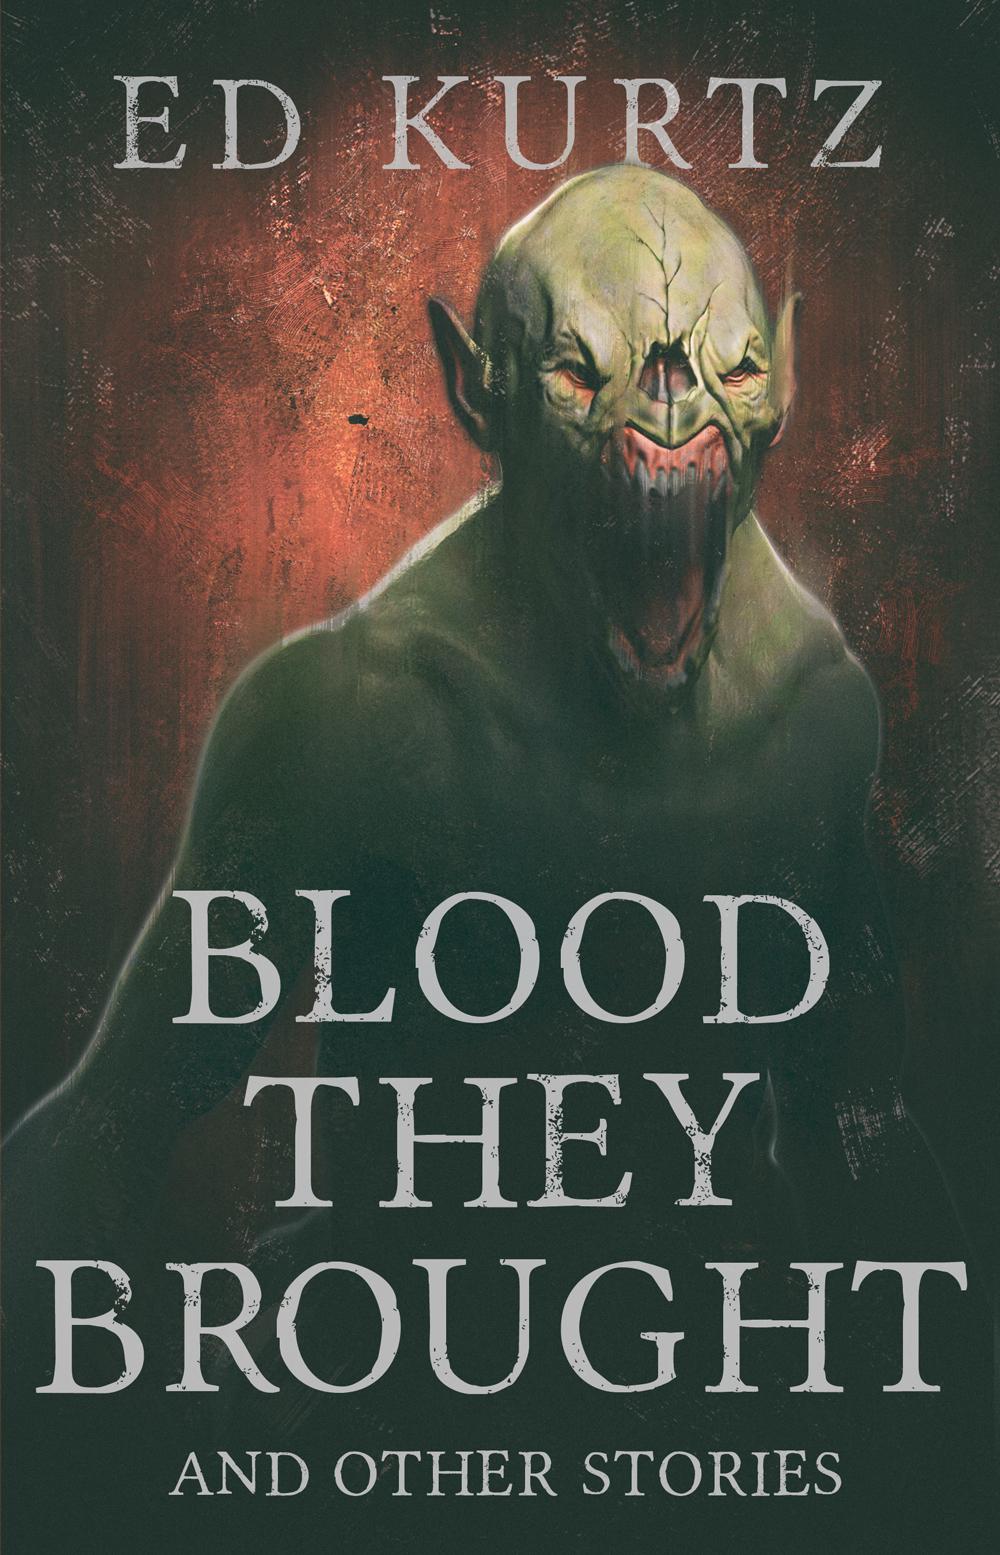 Blood They Brought_Ed Kurtz.jpg